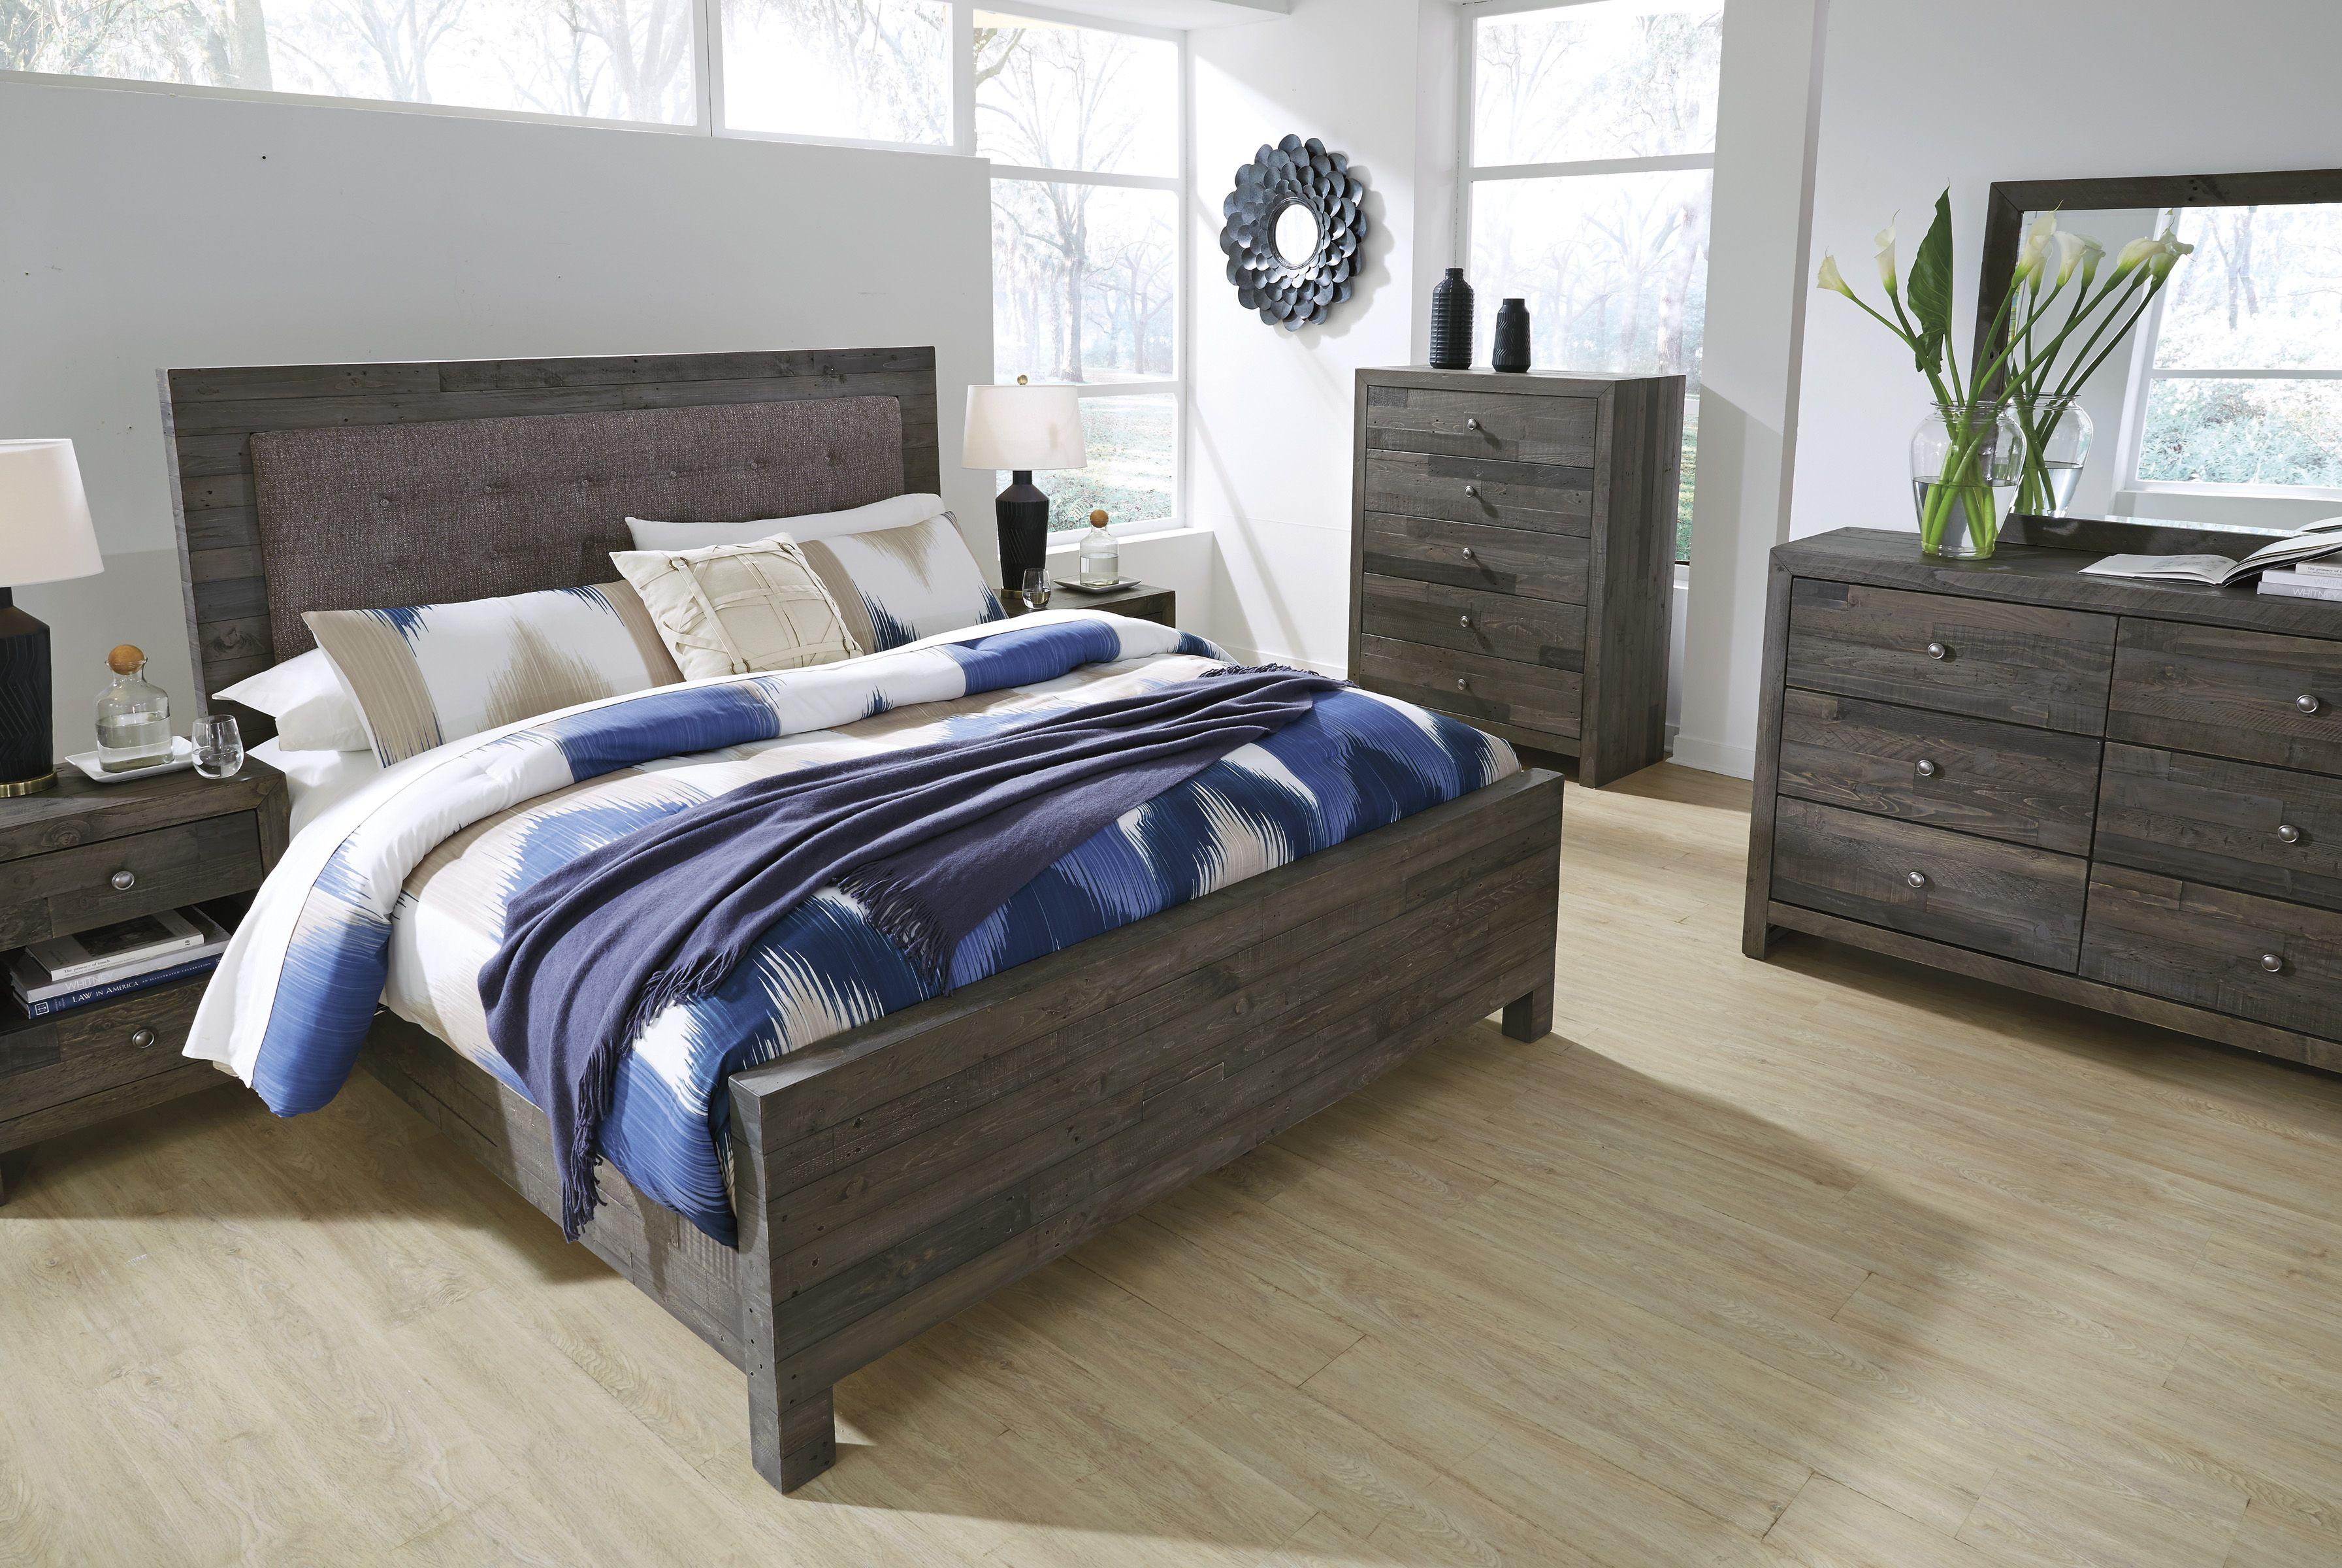 Mayflyn 5 Piece Queen Upholstered Bedroom Upholstered